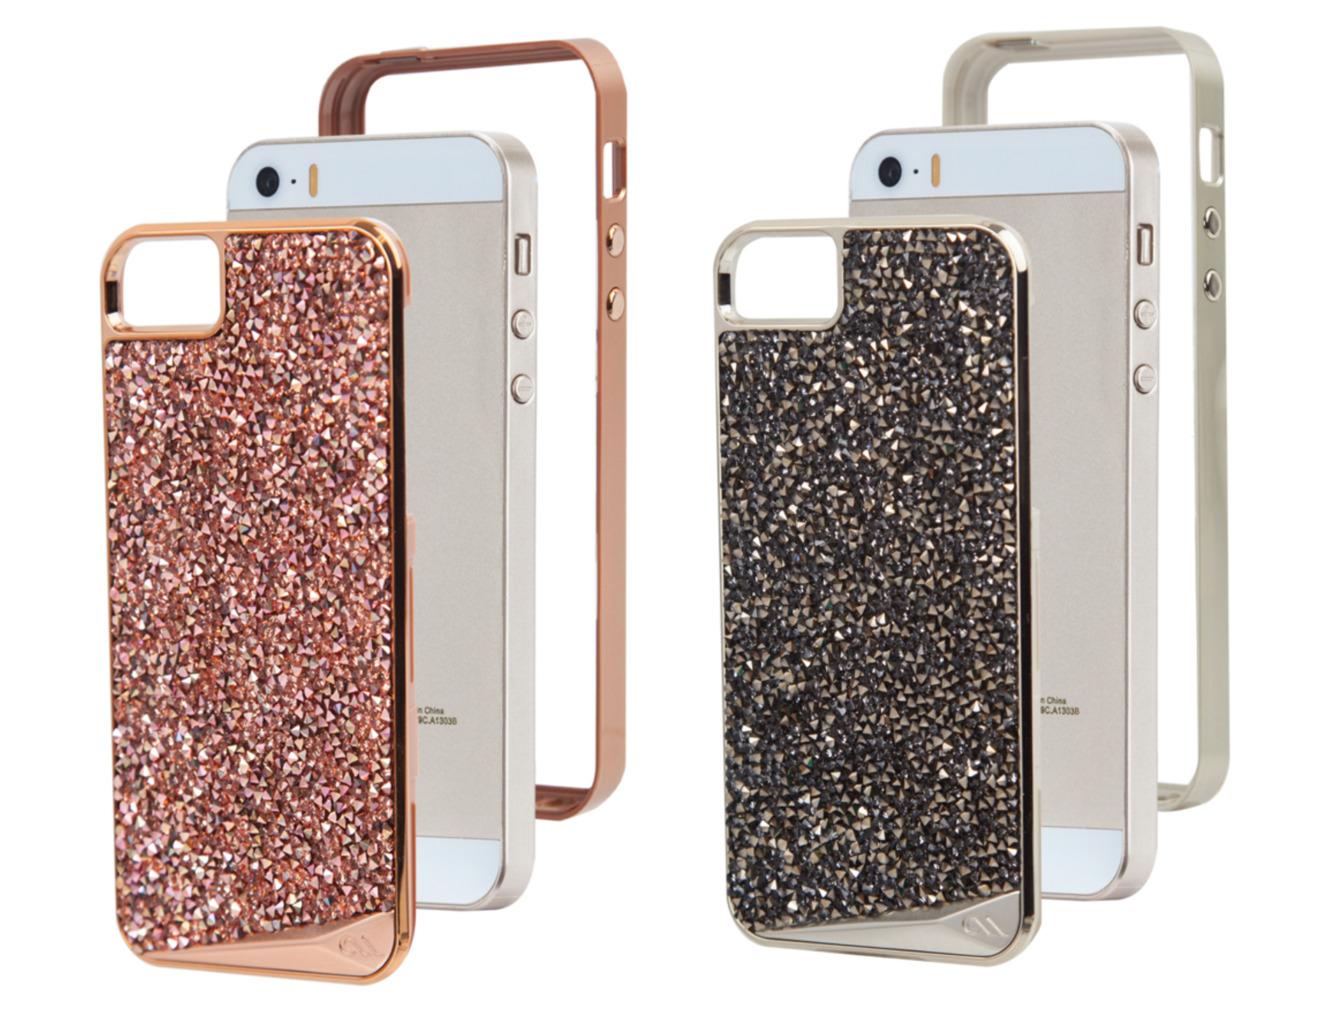 Case-Mate Brilliance iPhone SE Case